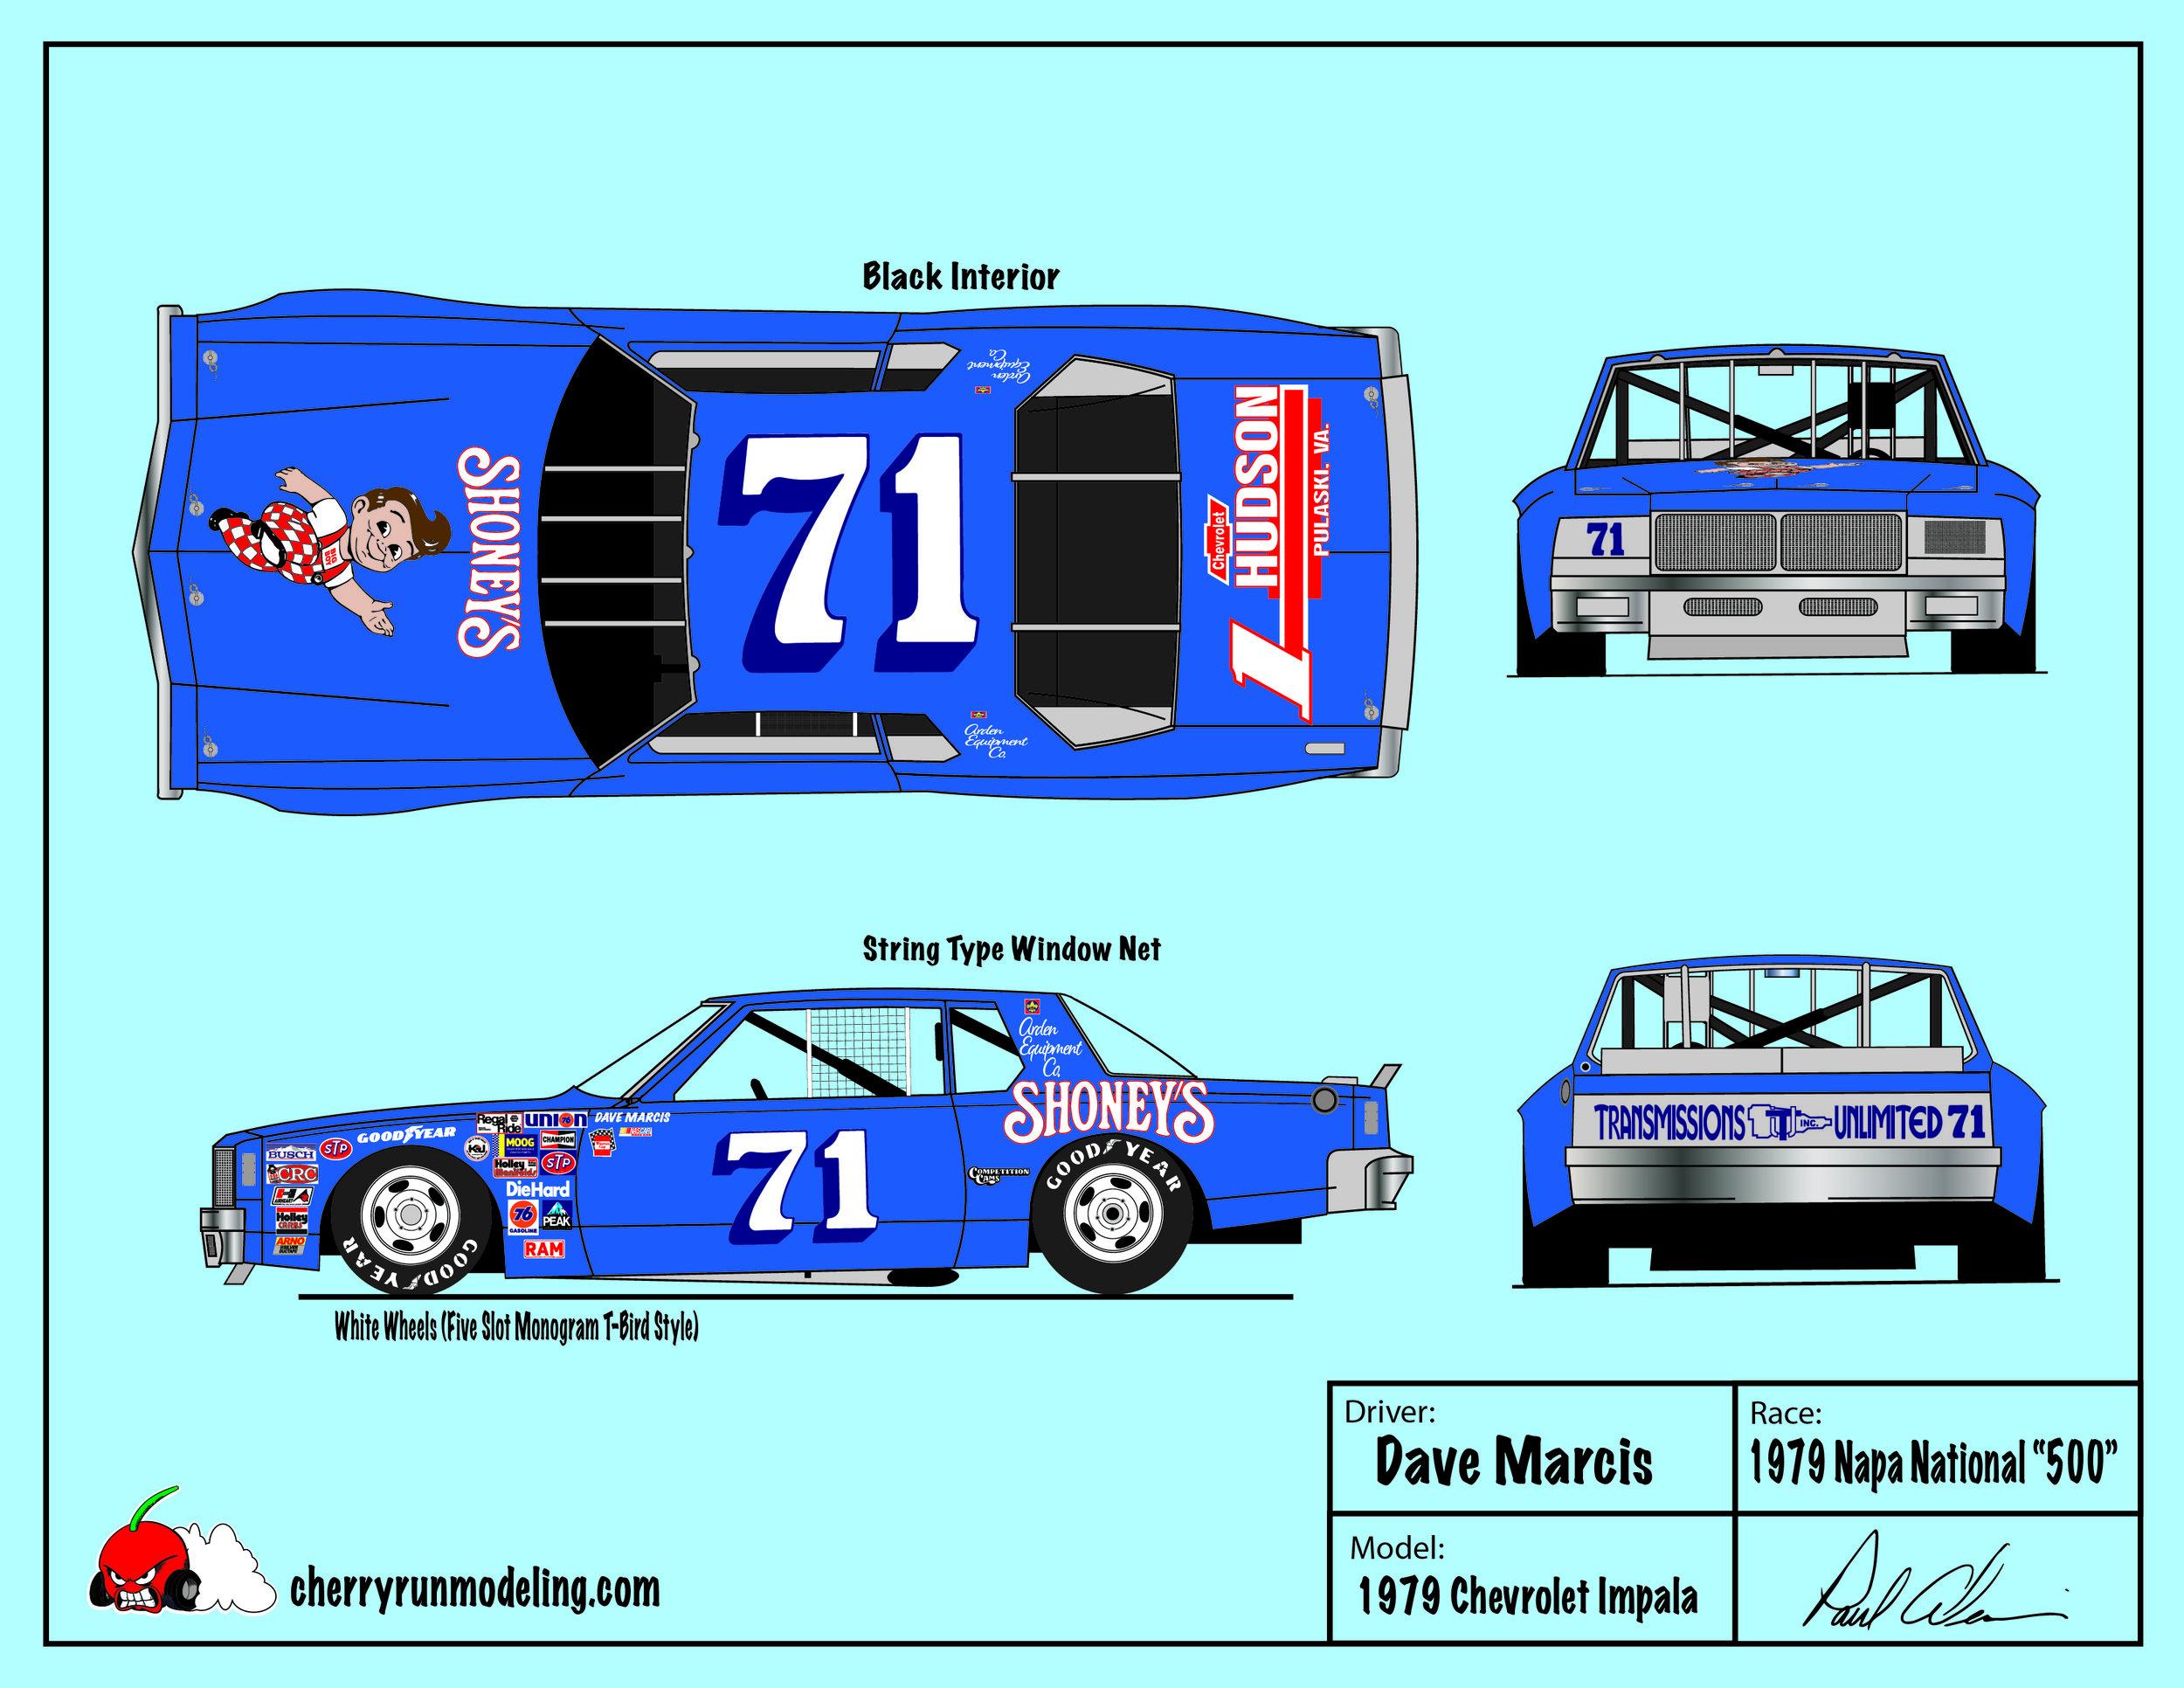 Dave Marcis 1979 Napa National 500.jpg